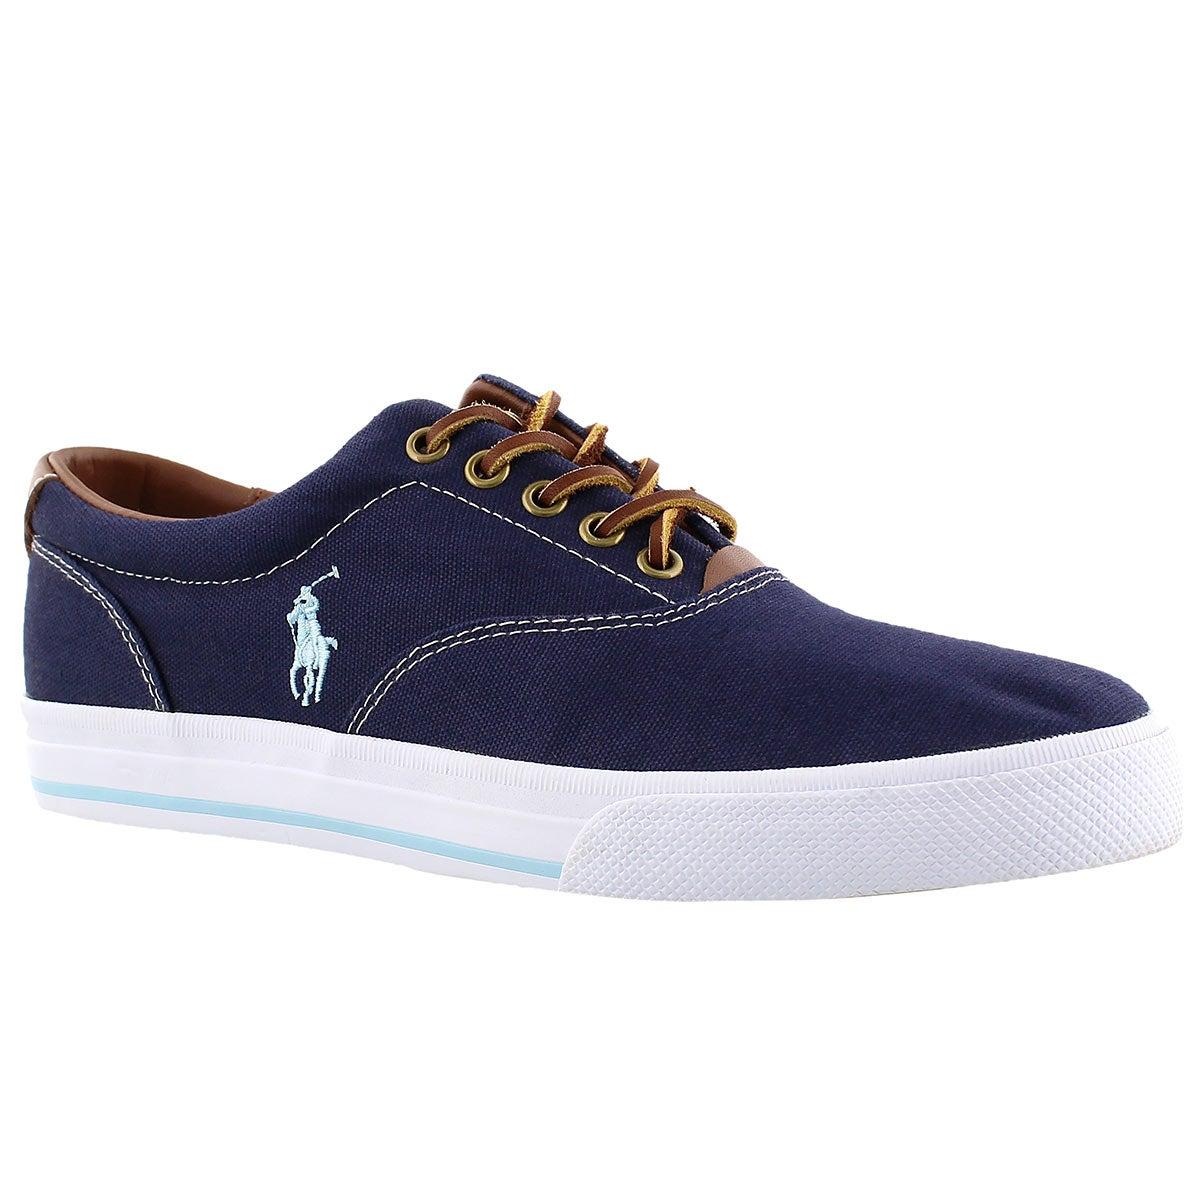 Men's VAUGHN navy canvas/leather CVO sneakers